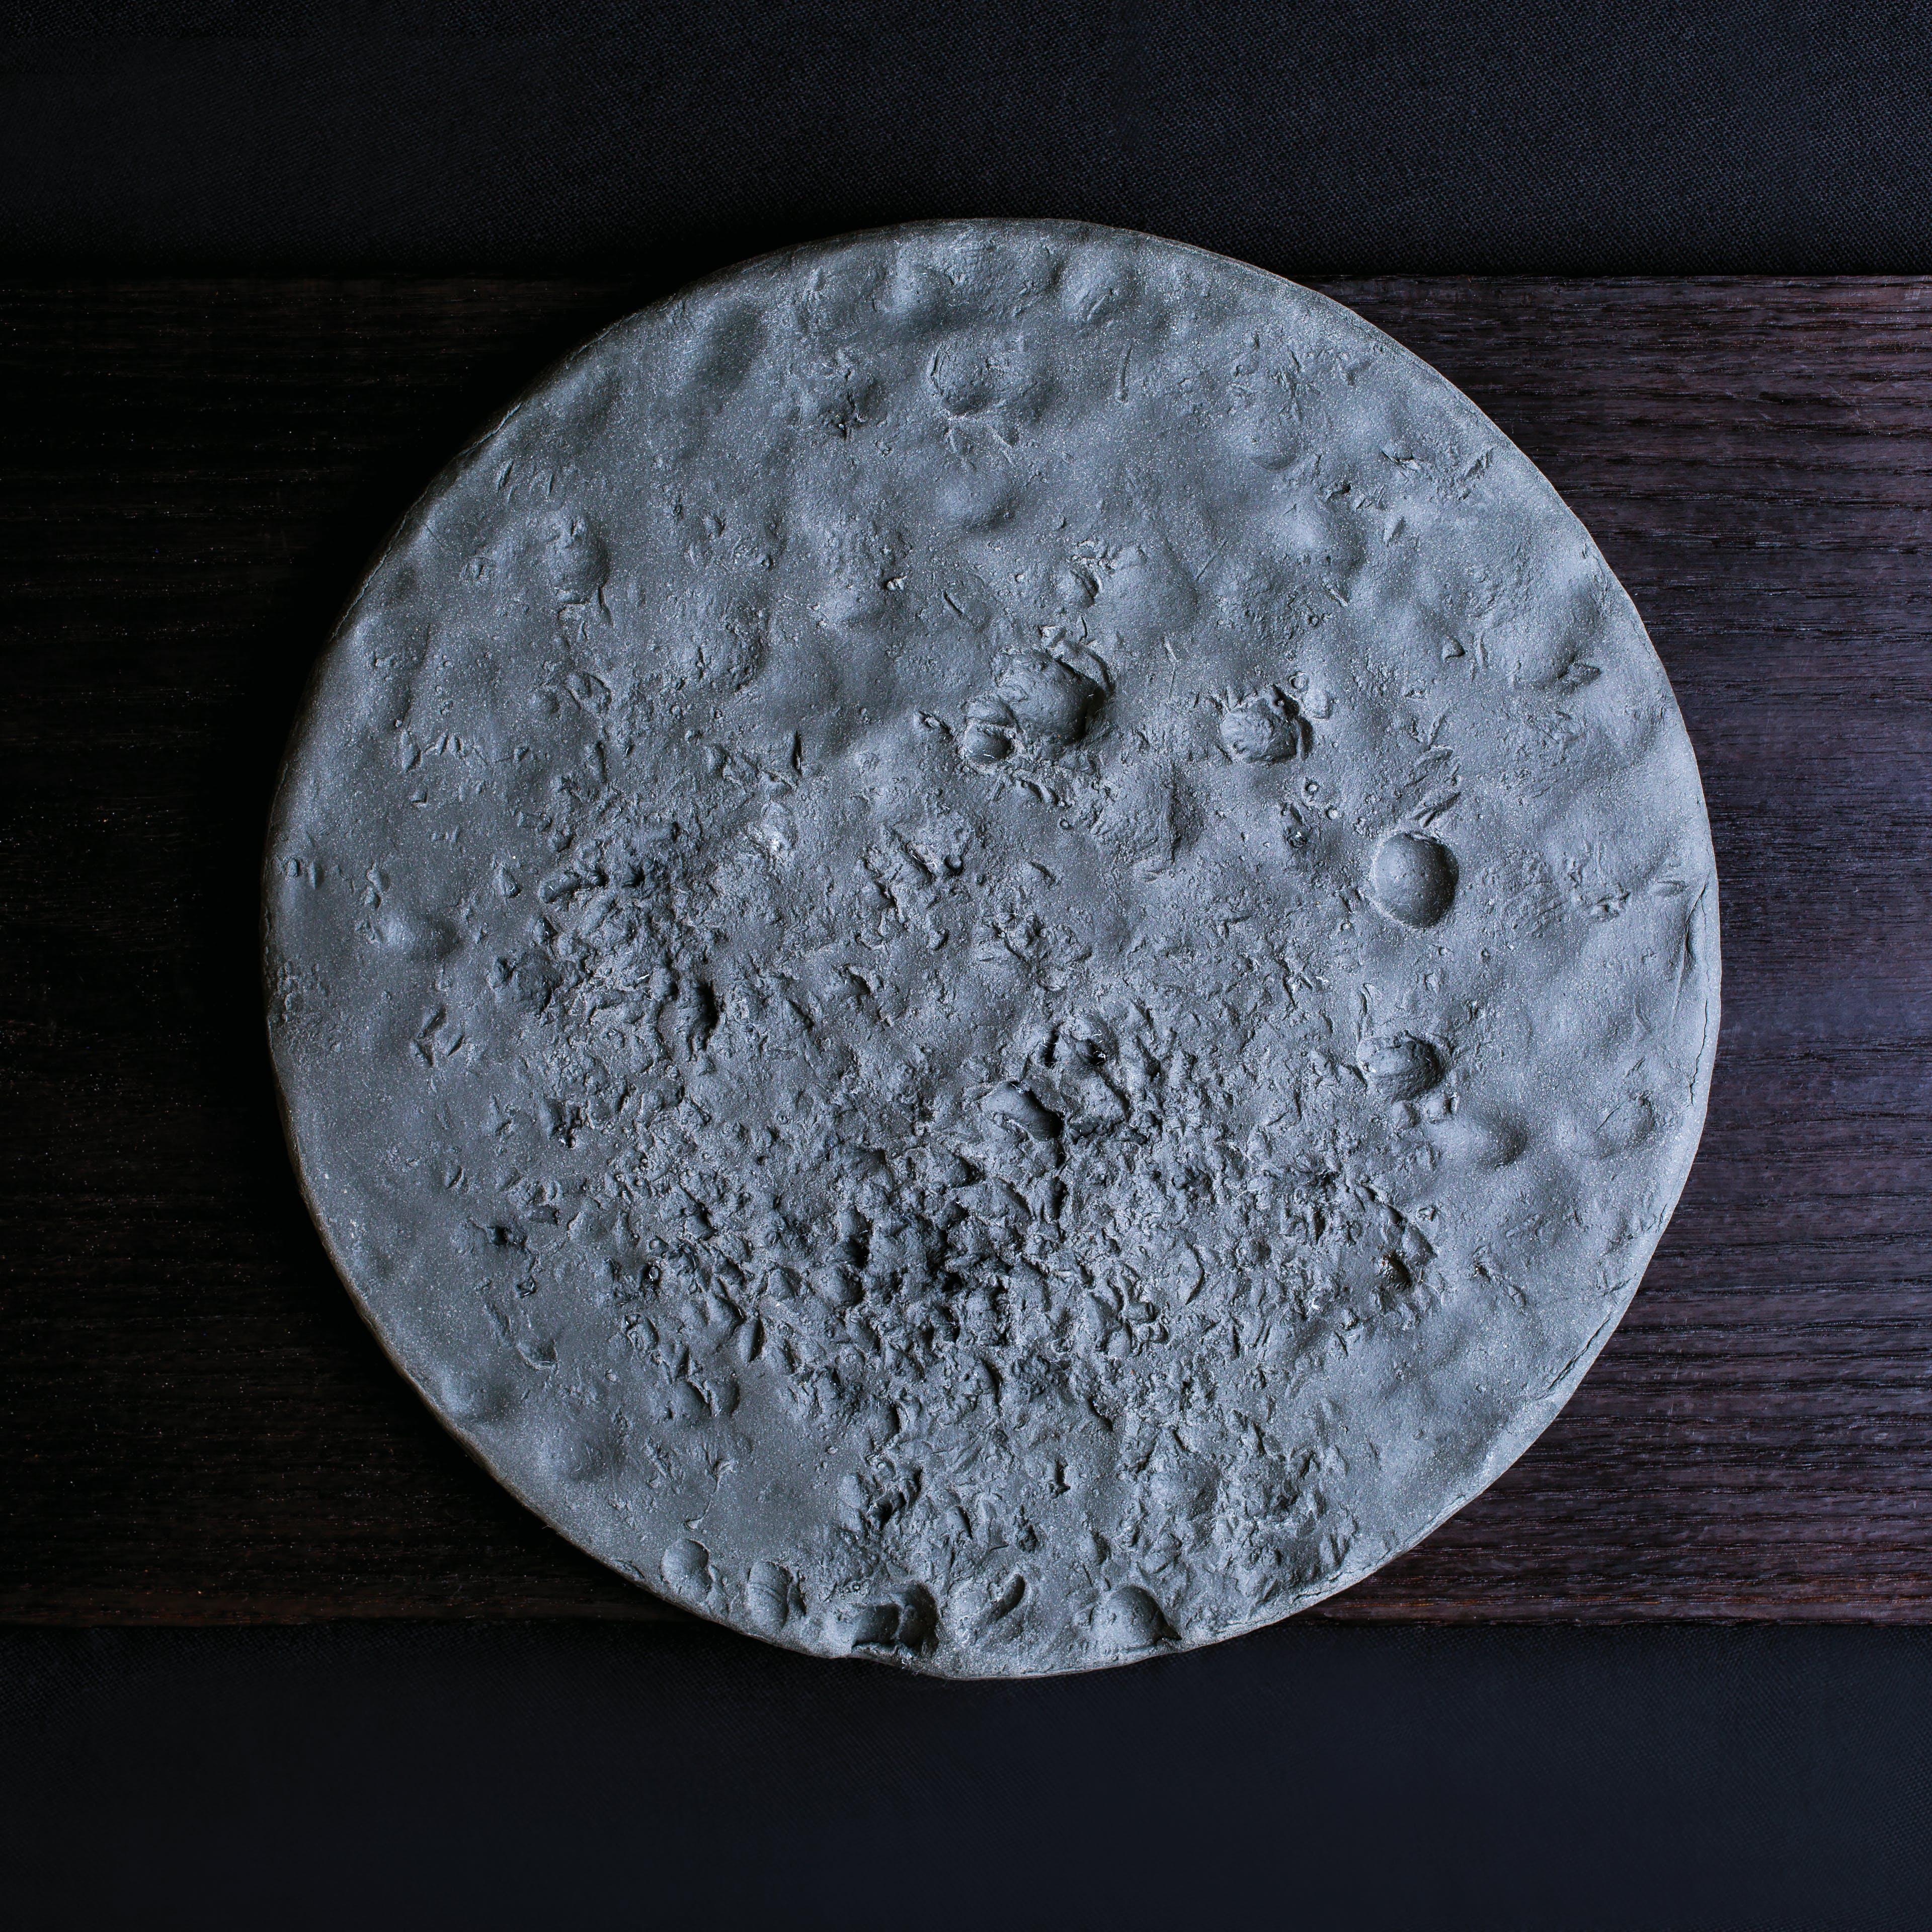 Gray round pocked ceramic plate on wood planks